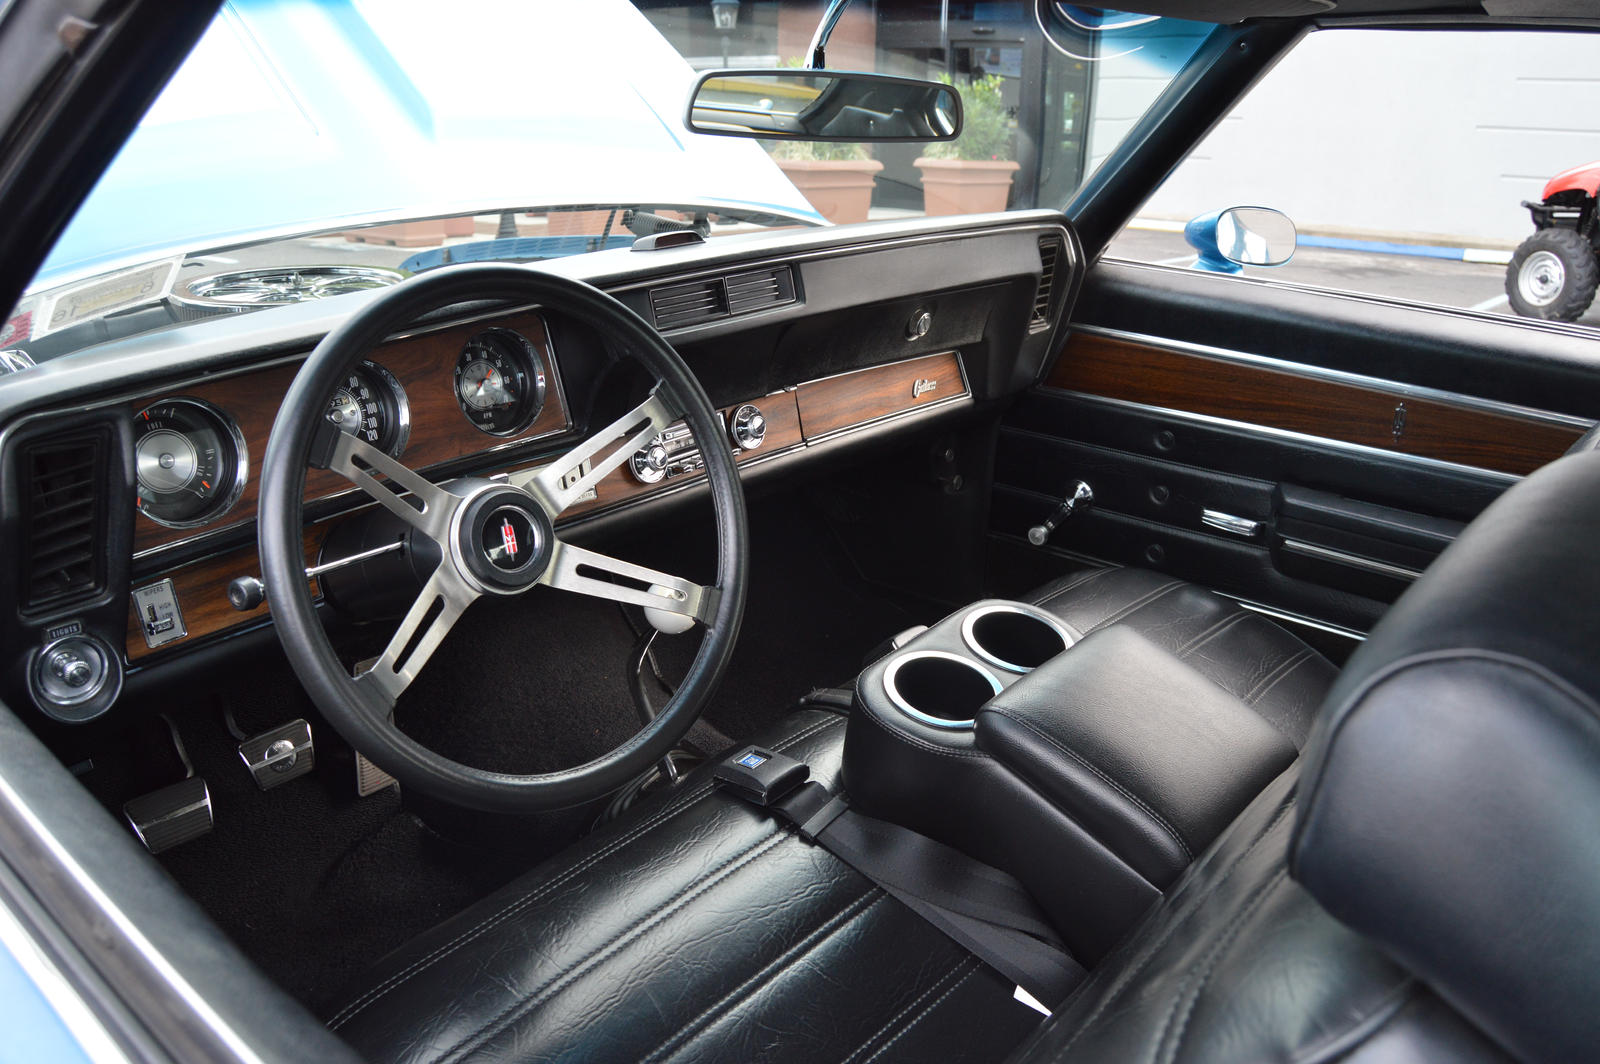 1972 Oldsmobile 442 W 30 Interior By Brooklyn47 On Deviantart